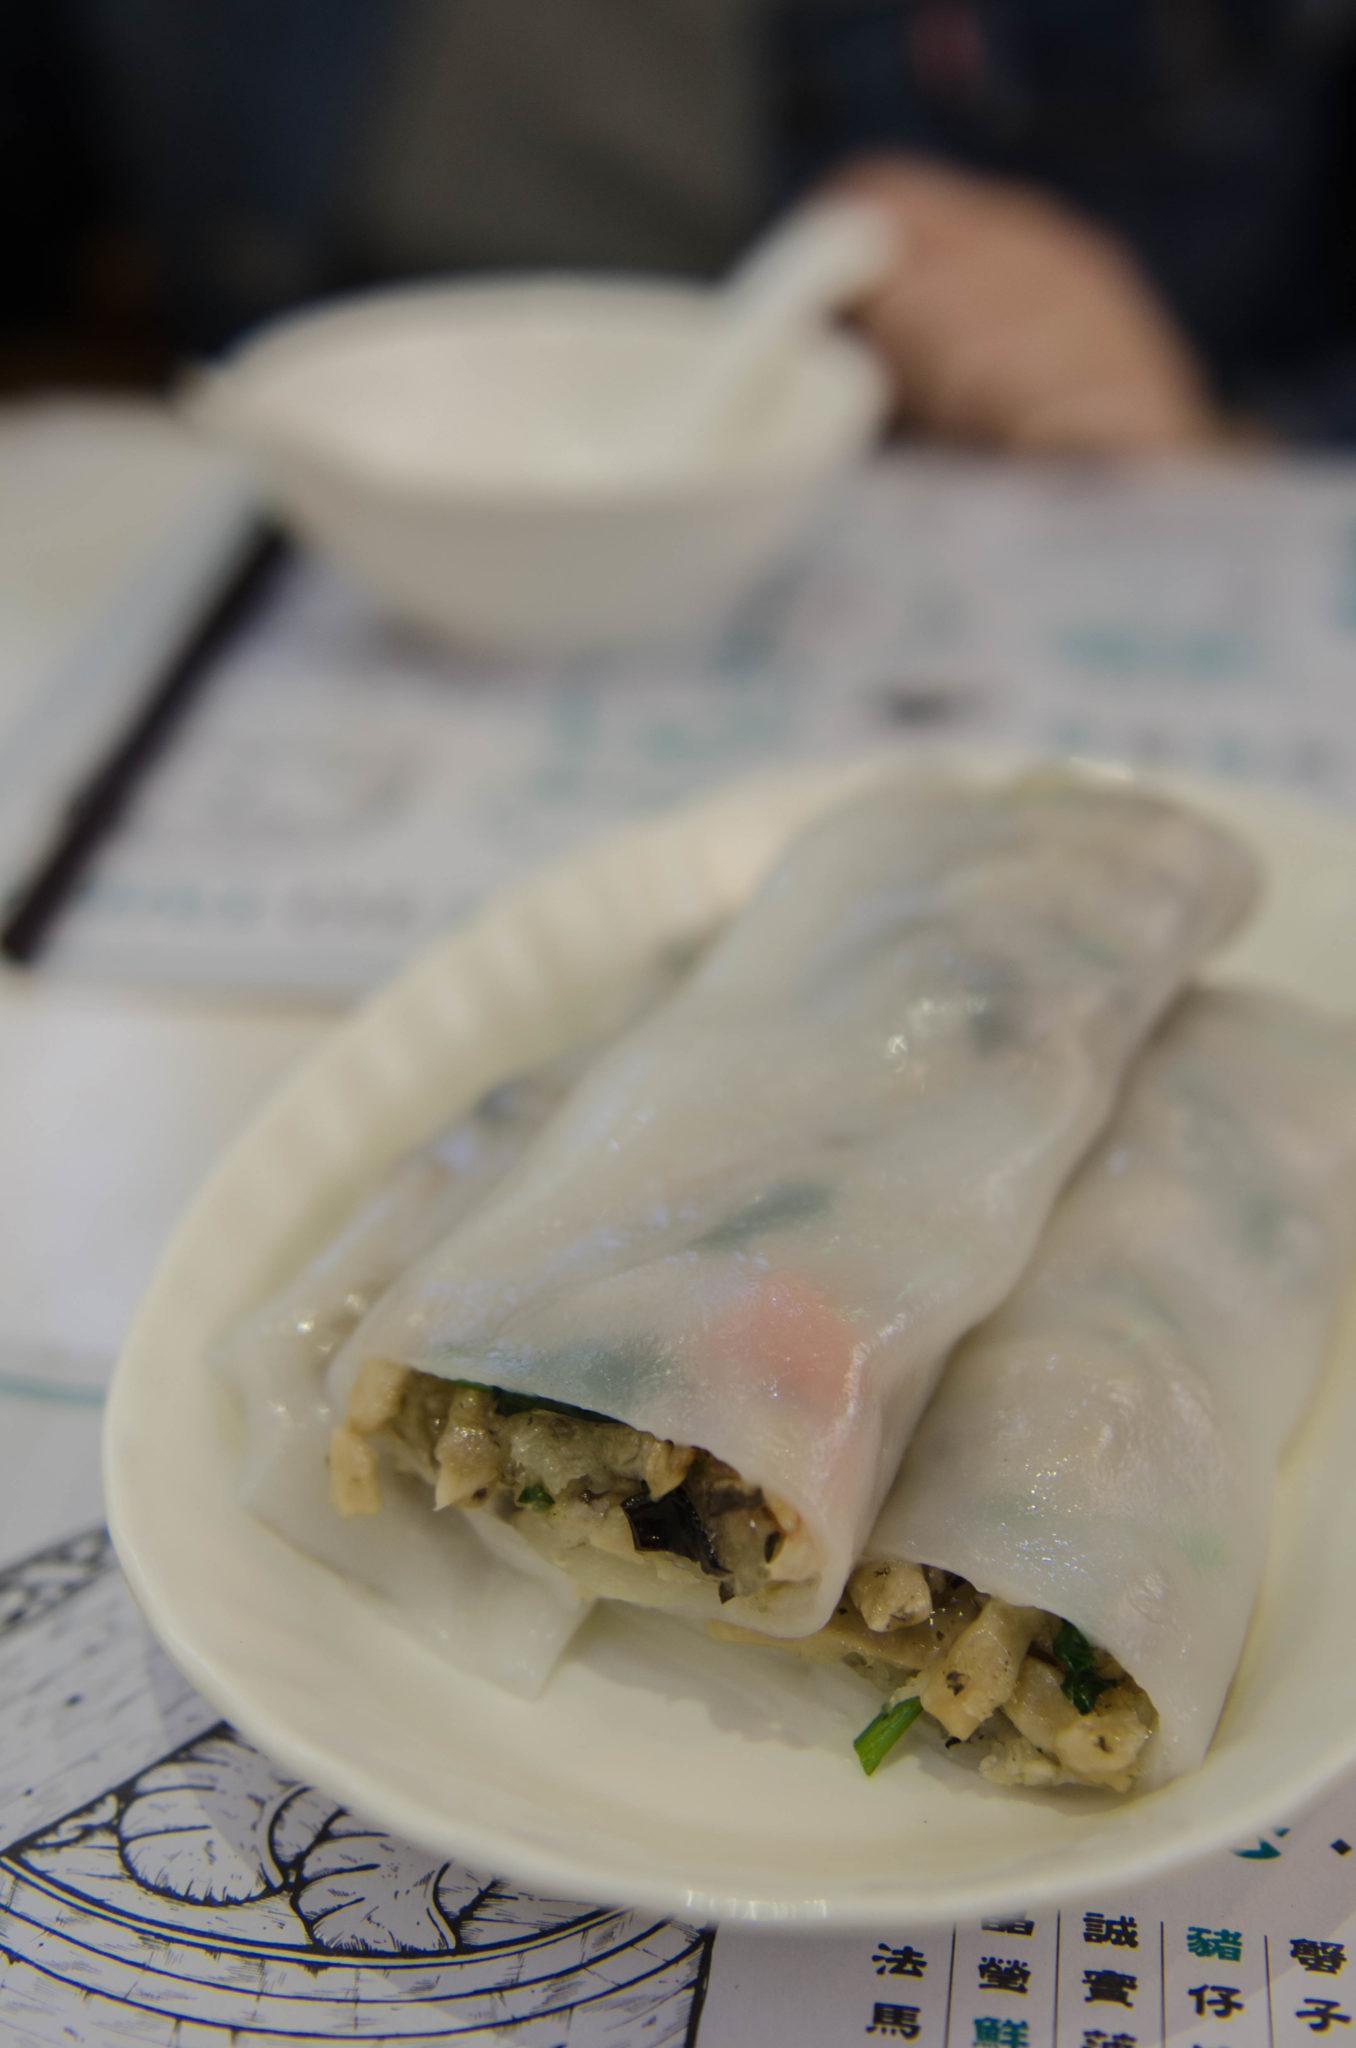 Hongkong Reisetipps: Reisrollen sehen zwar nicht schön aus, schmecken aber super lecker.